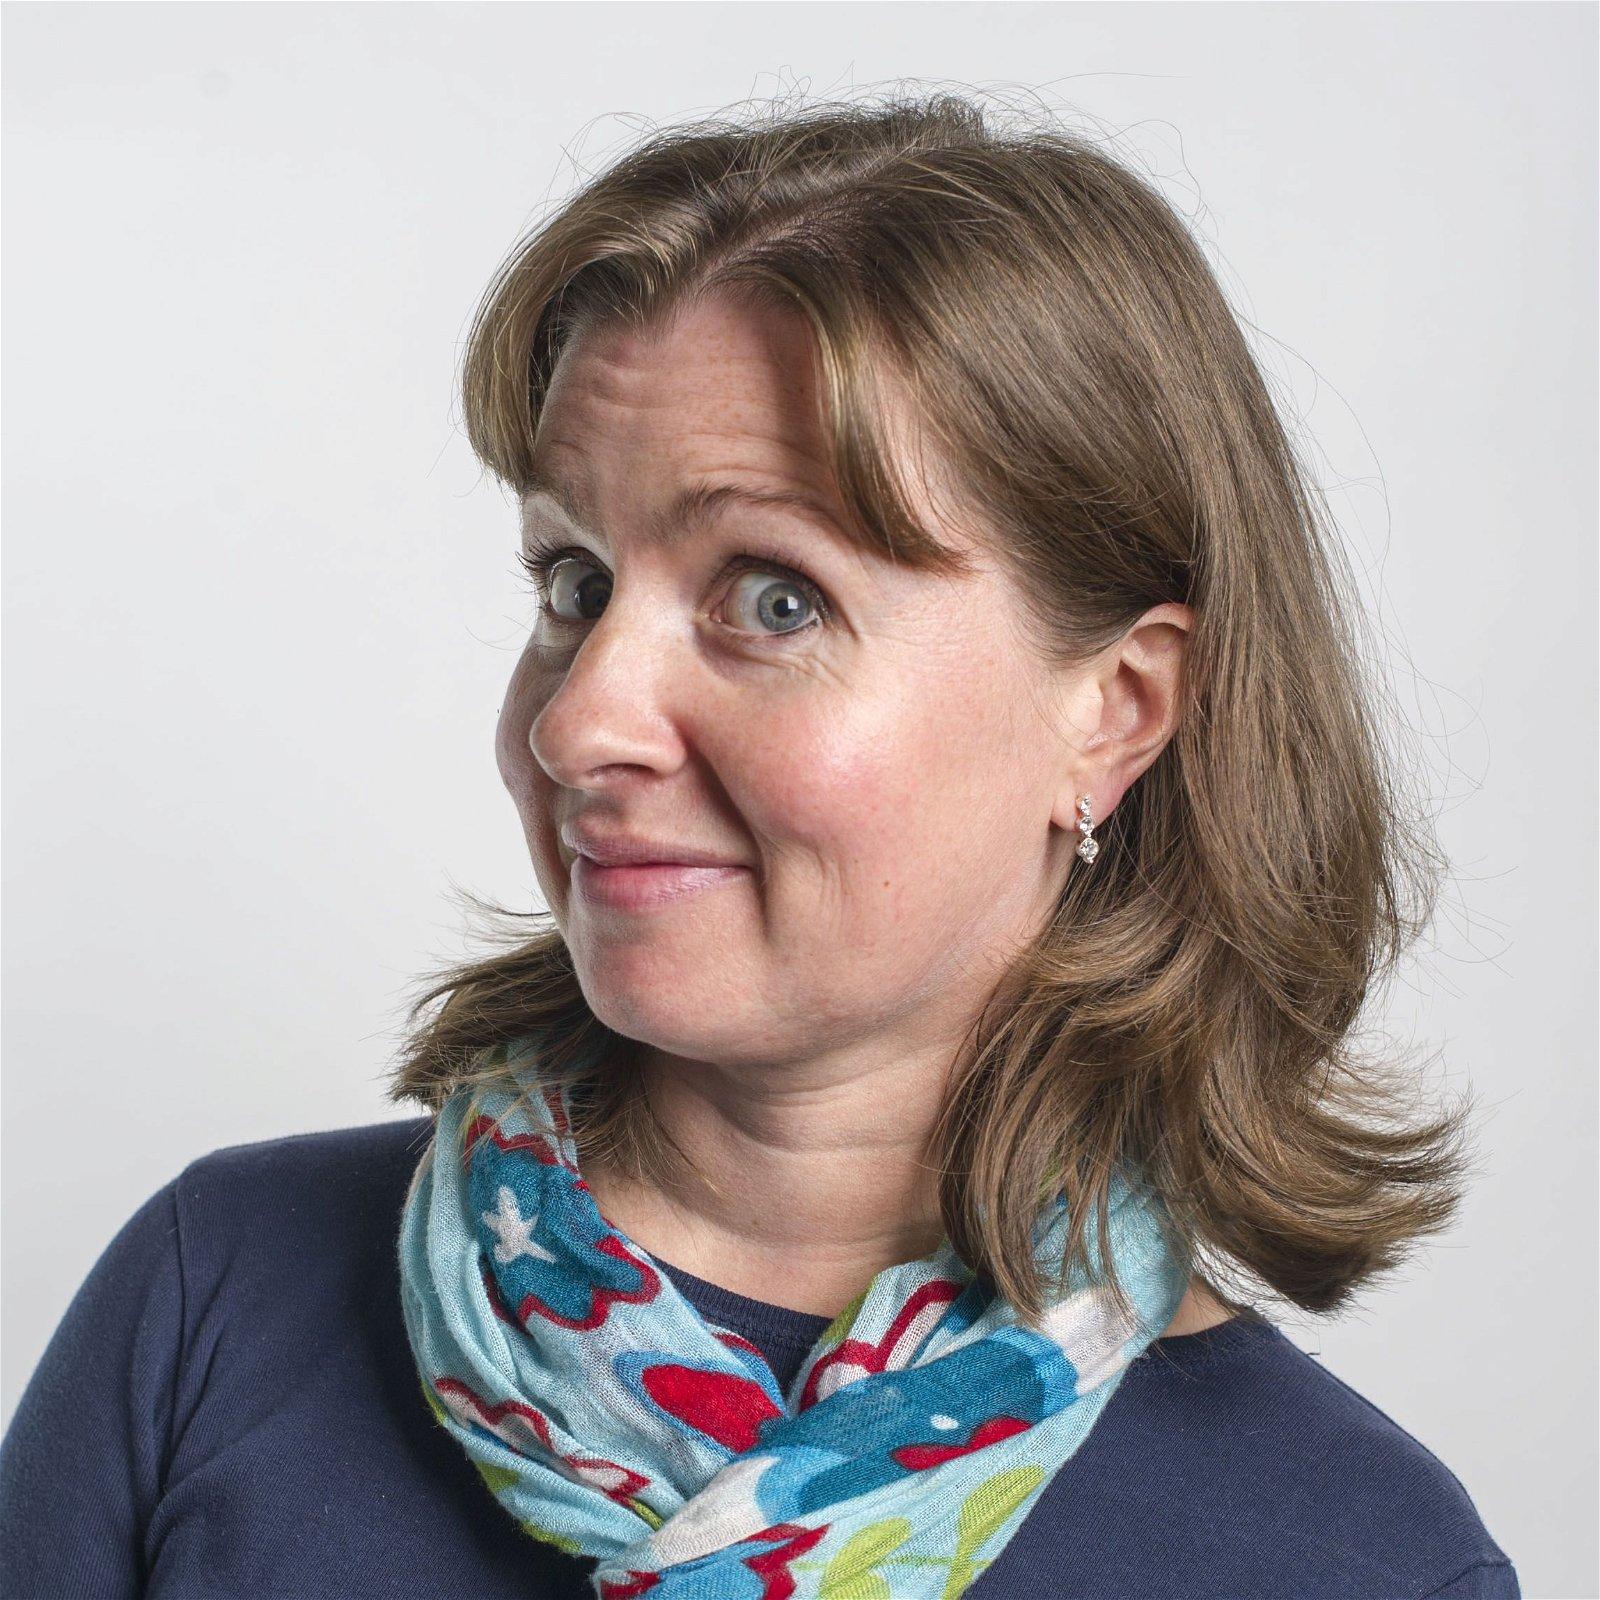 Julie-Waddell-Moorish-Hummus-female-entrepreneur-speaker-at-Great-British-Speakers